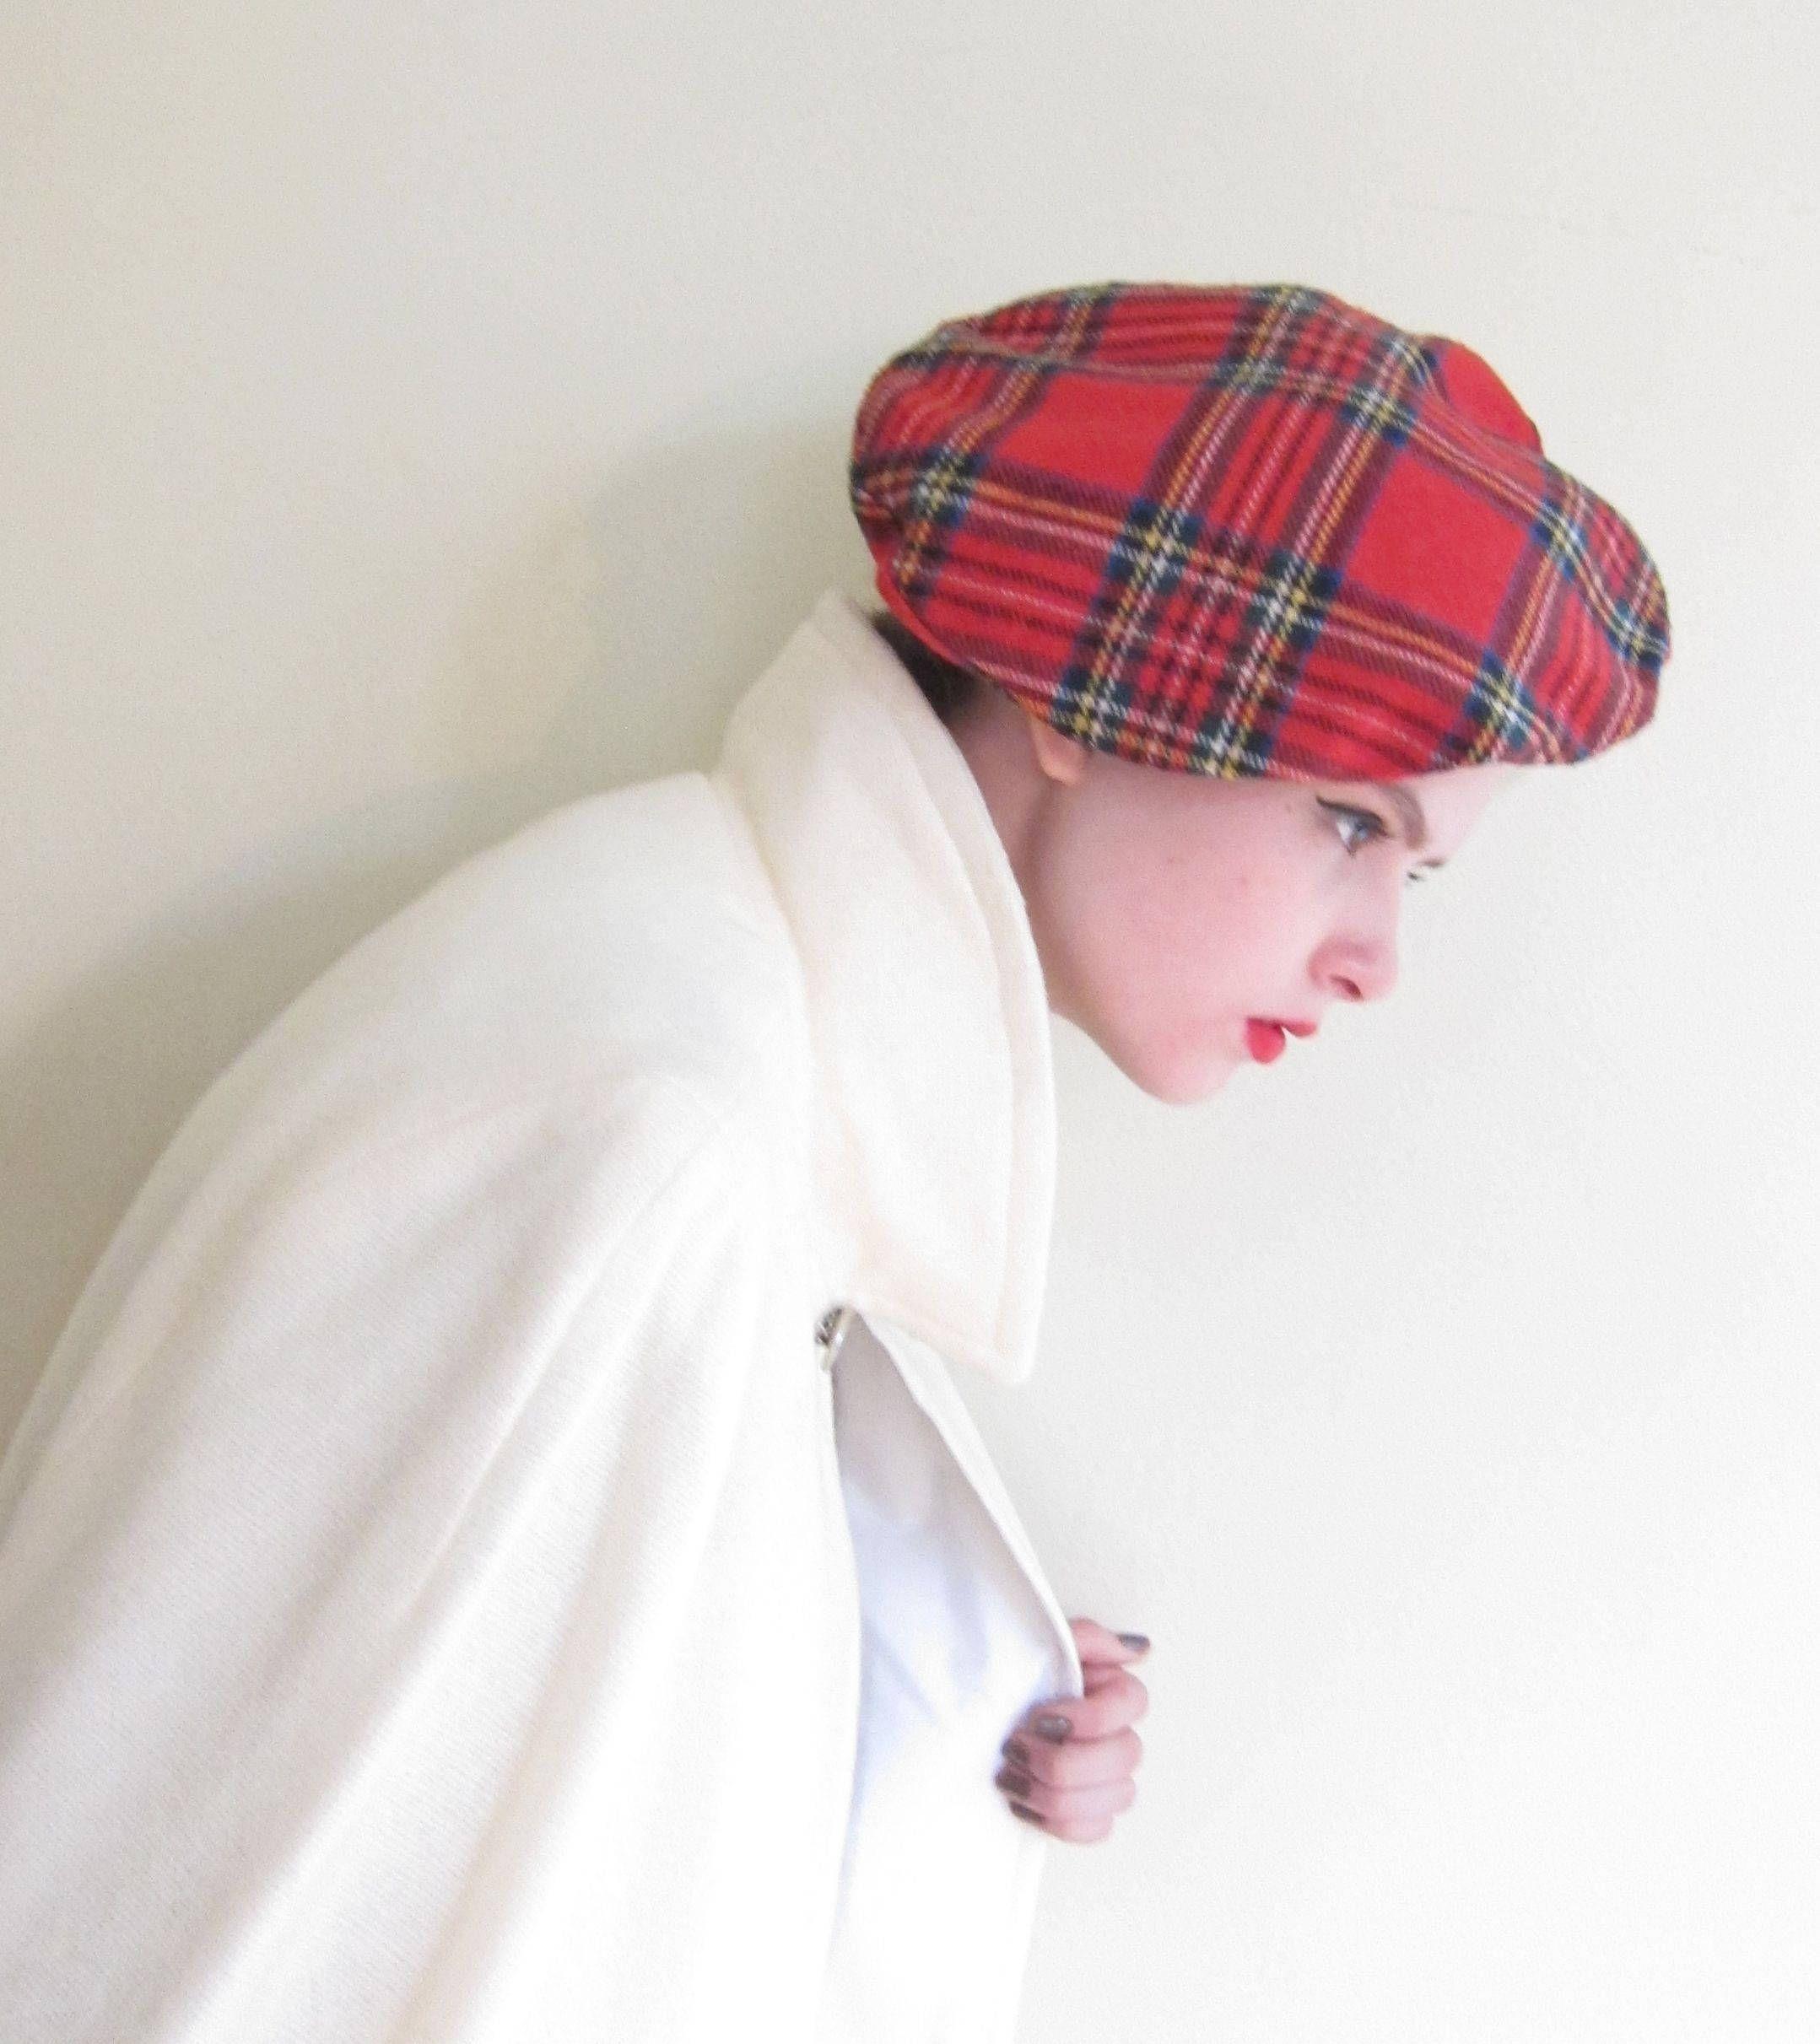 6650c818de350 Vintage 1960s Red Plaid Tam Hat   60s Tartan Wool Beret Hat England English  Mod British Neiman Marcus by BasyaBerkman on Etsy